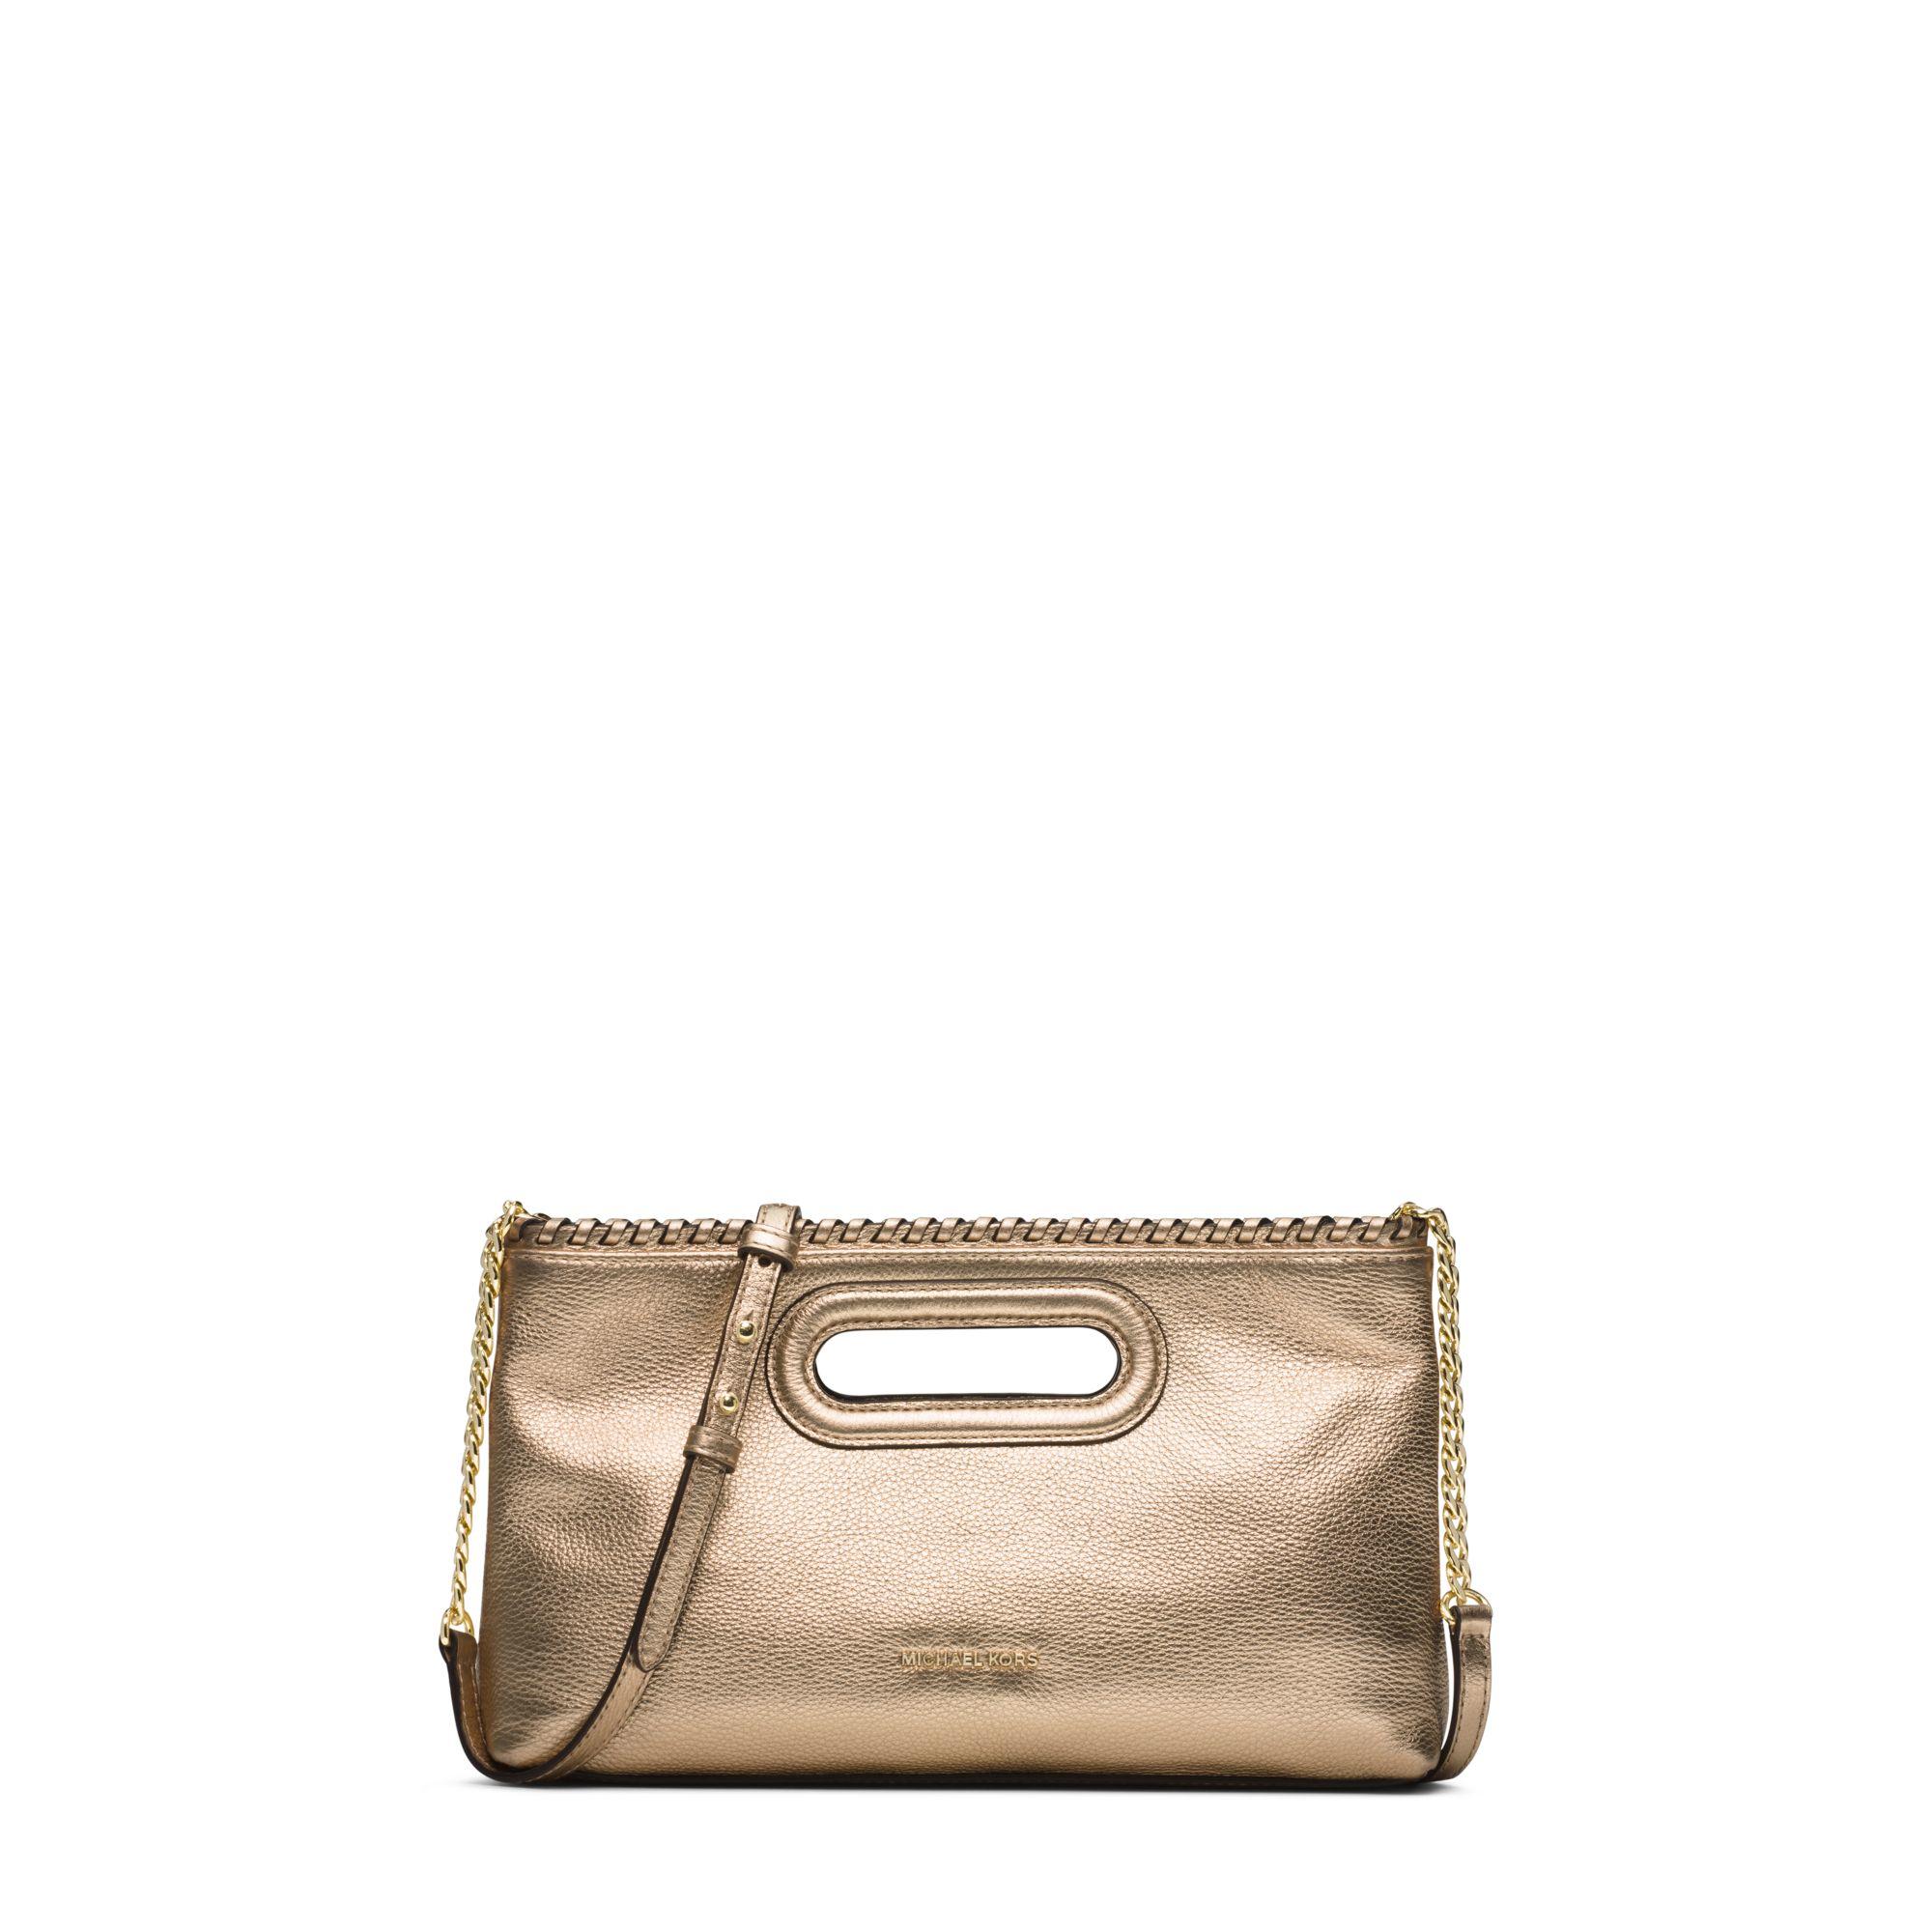 33907cba8edc3 ... GOLD MK SIG MIRROR METALLIC LEATHER CARD CASE Gallery. Womens Metallic  Clutch Bags ...